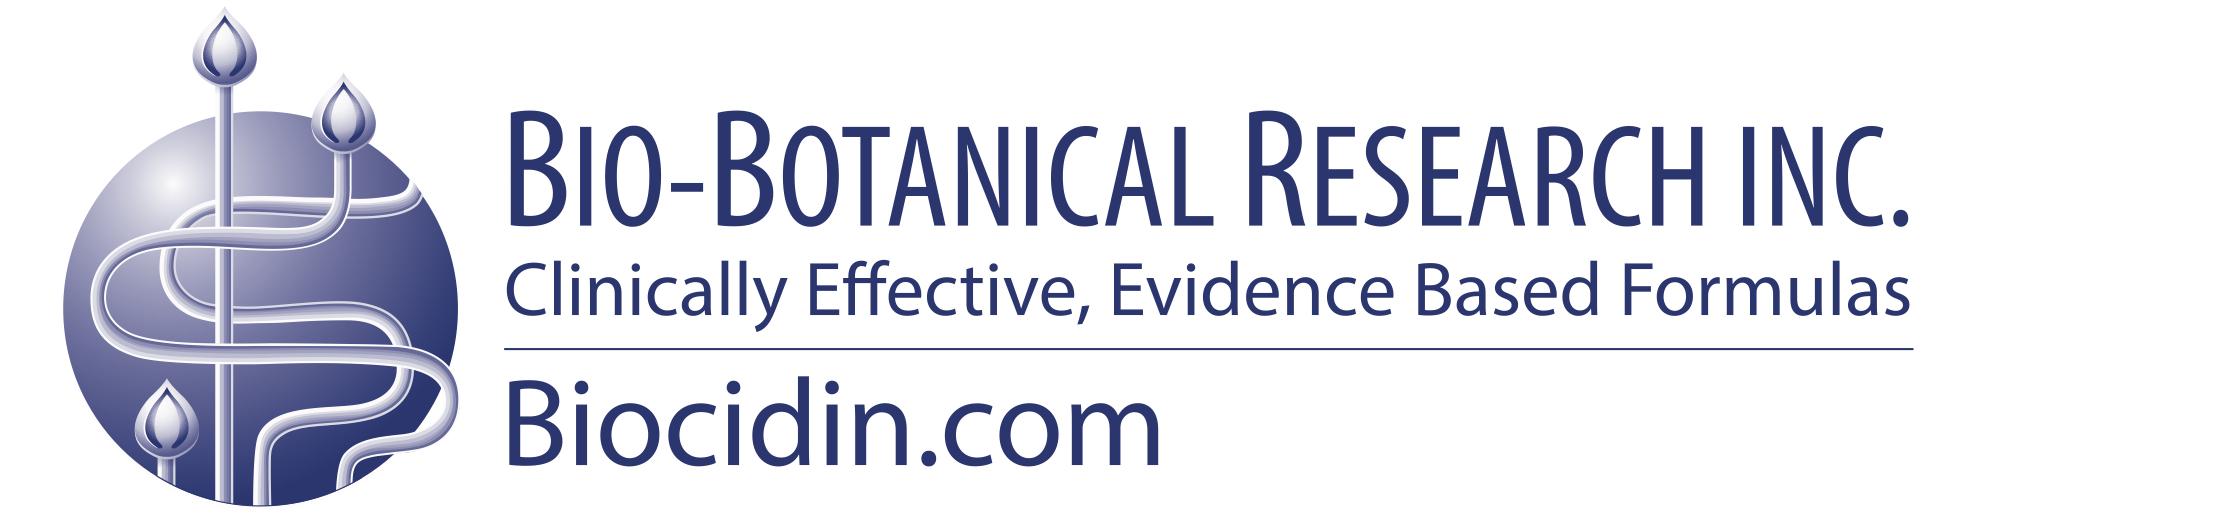 Bio-Botanical Research Inc